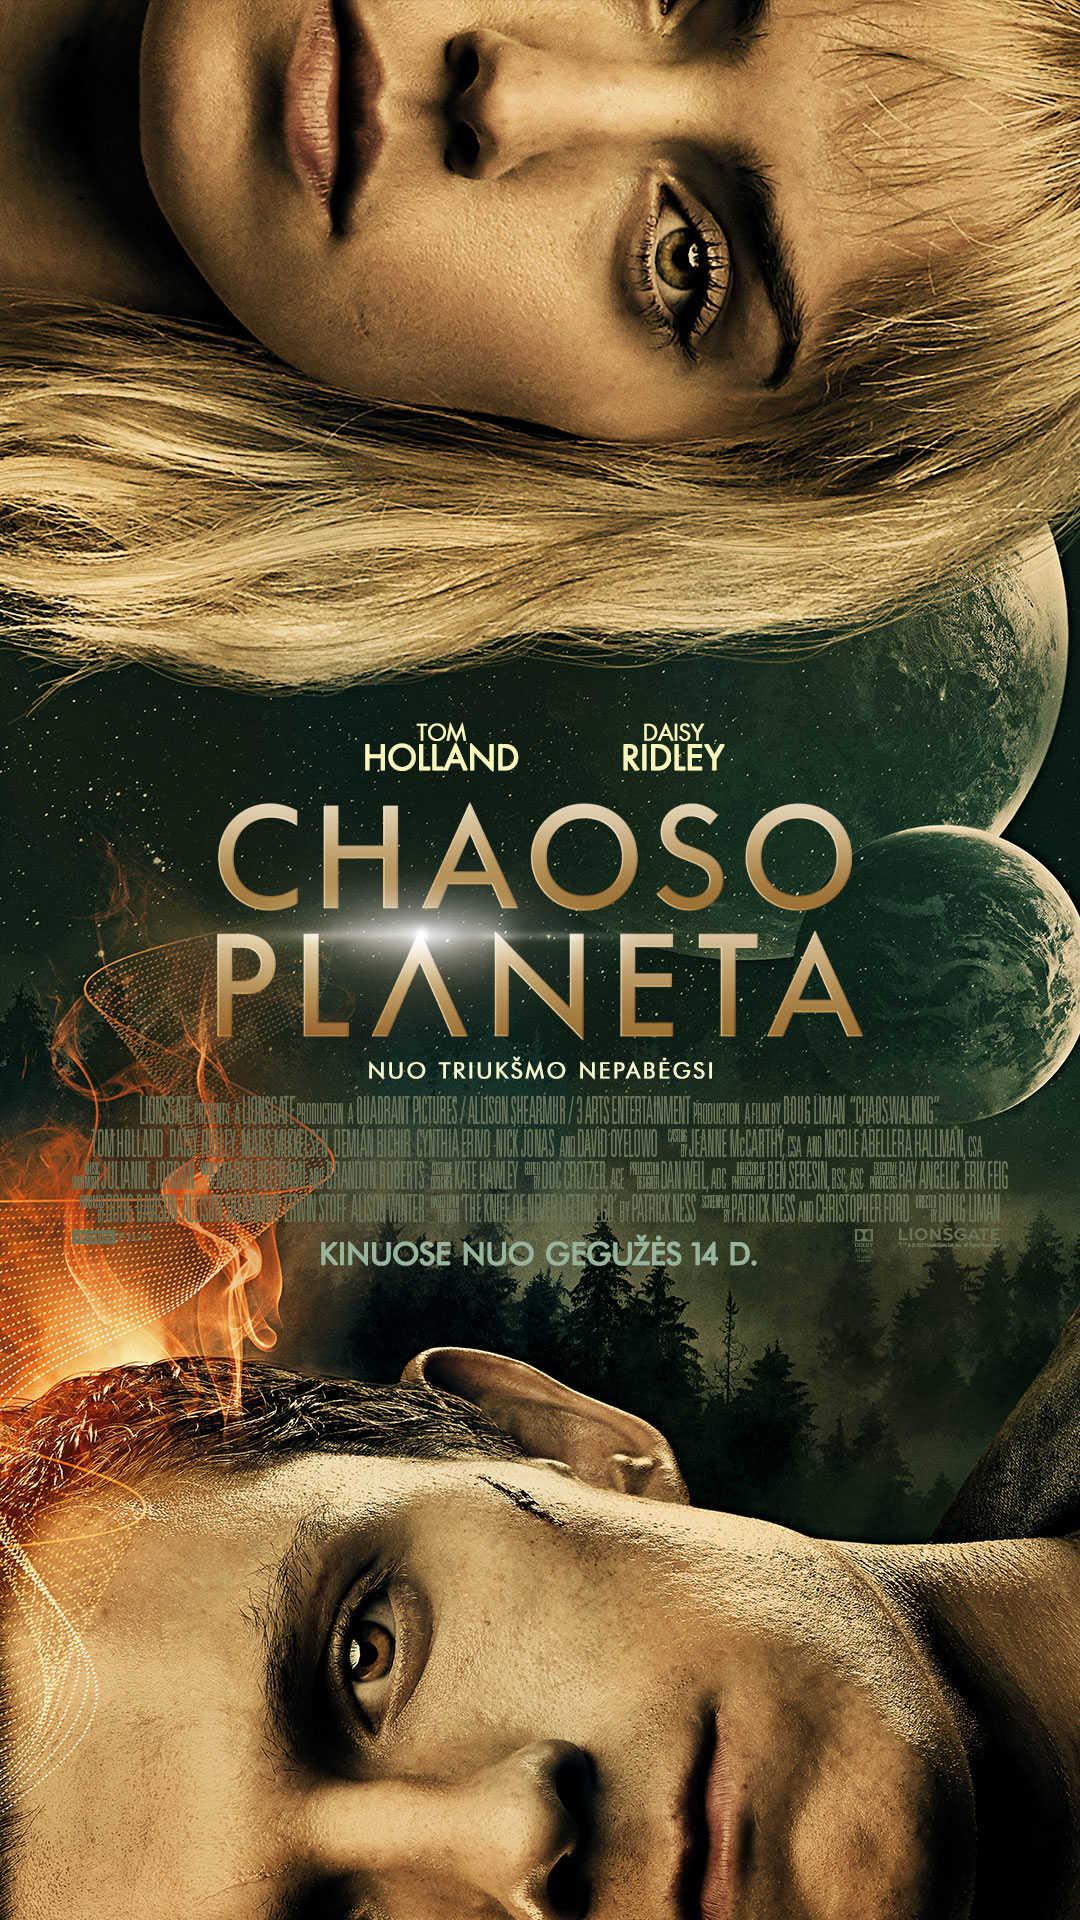 Chaoso planeta (Chaos Walking)